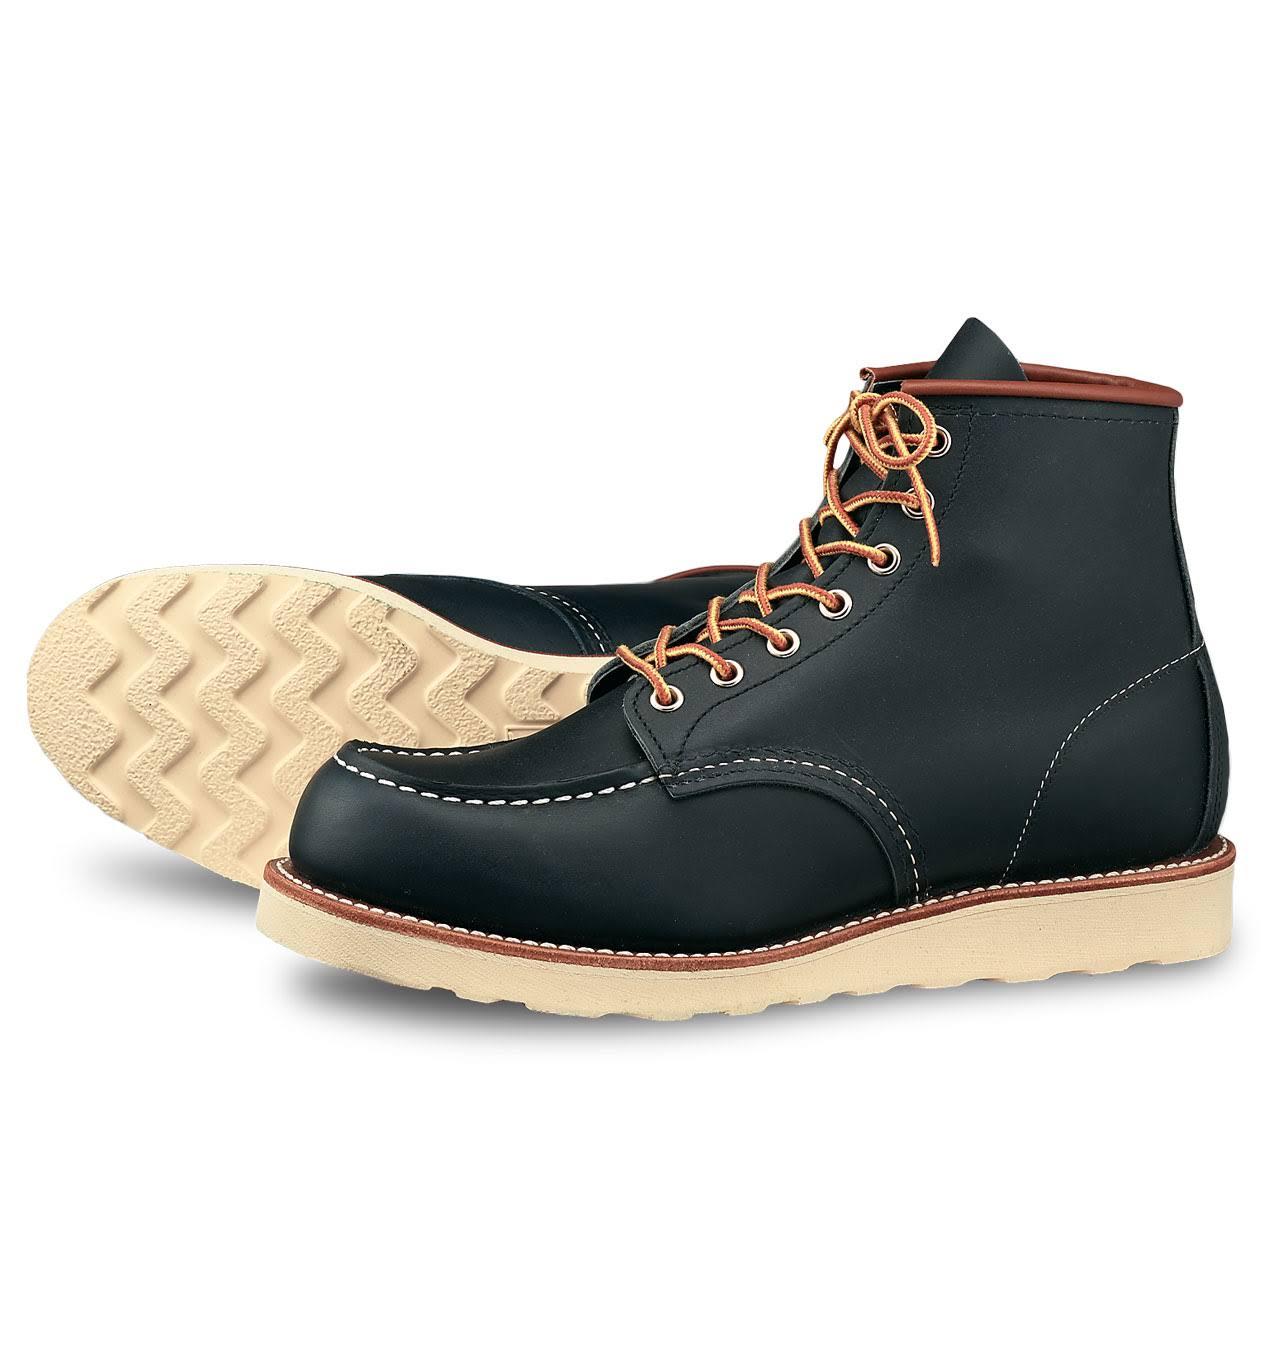 Toe Moc Red 45 Leather 6 Portage Shoes Wing Us11 8859 5Eu polliciNavy 80wOknXP